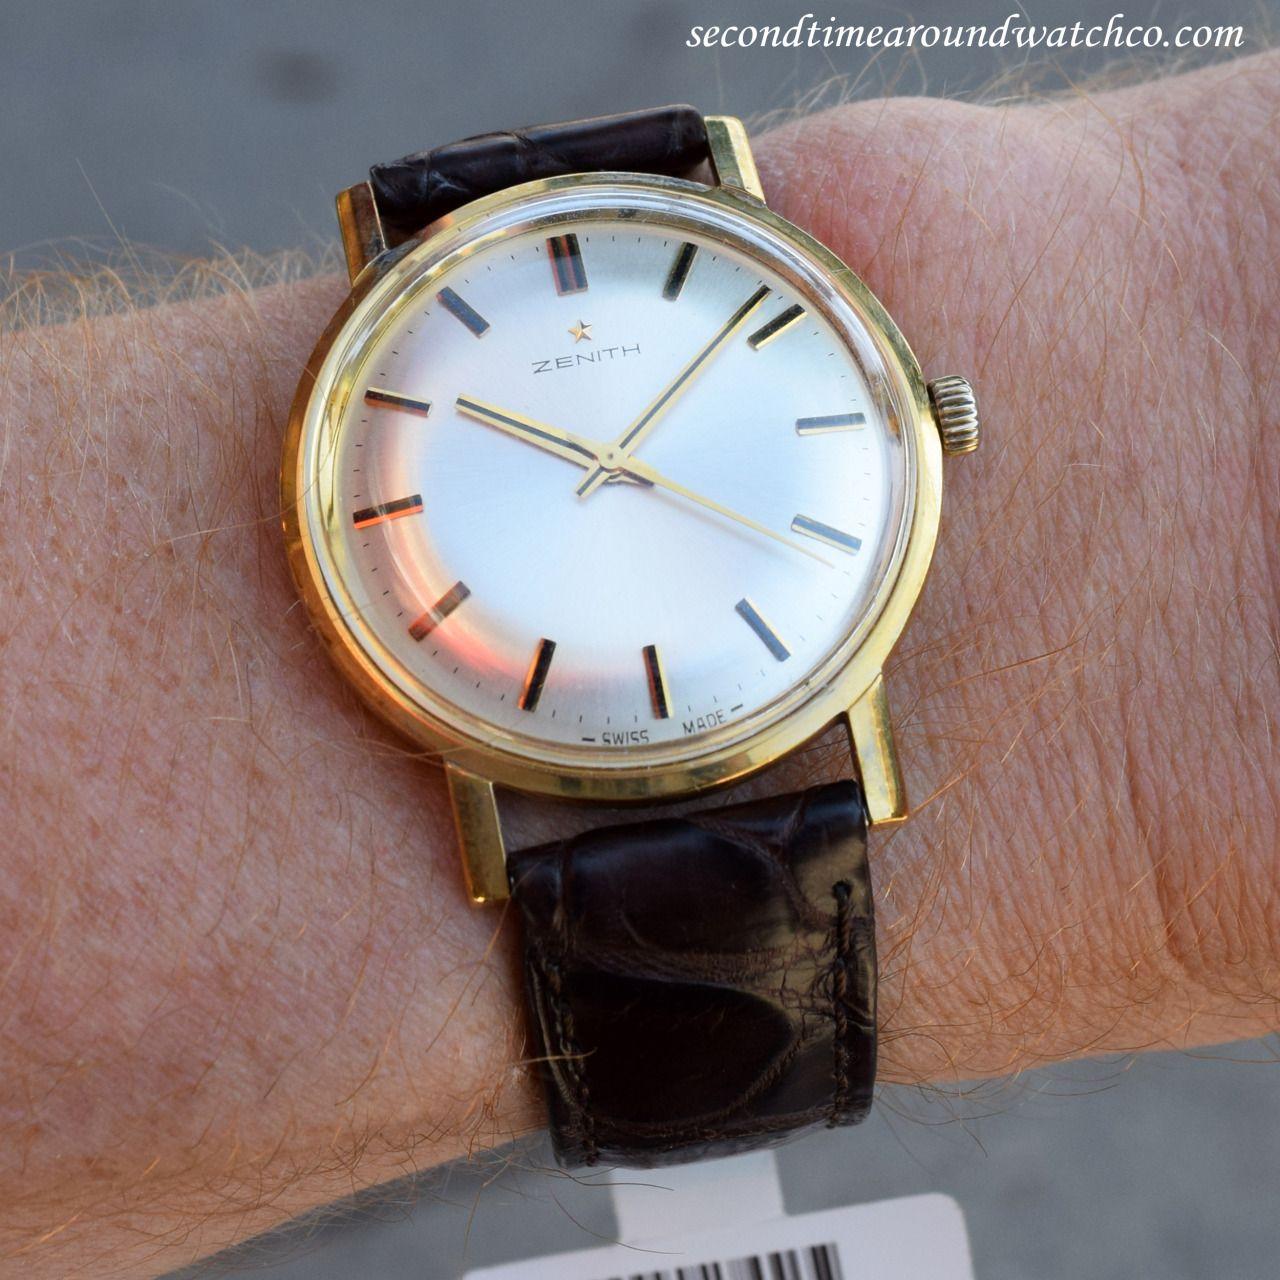 7417b5c8cda4 Today I m wearing a 1973 vintage Zenith dress watch with an original ...